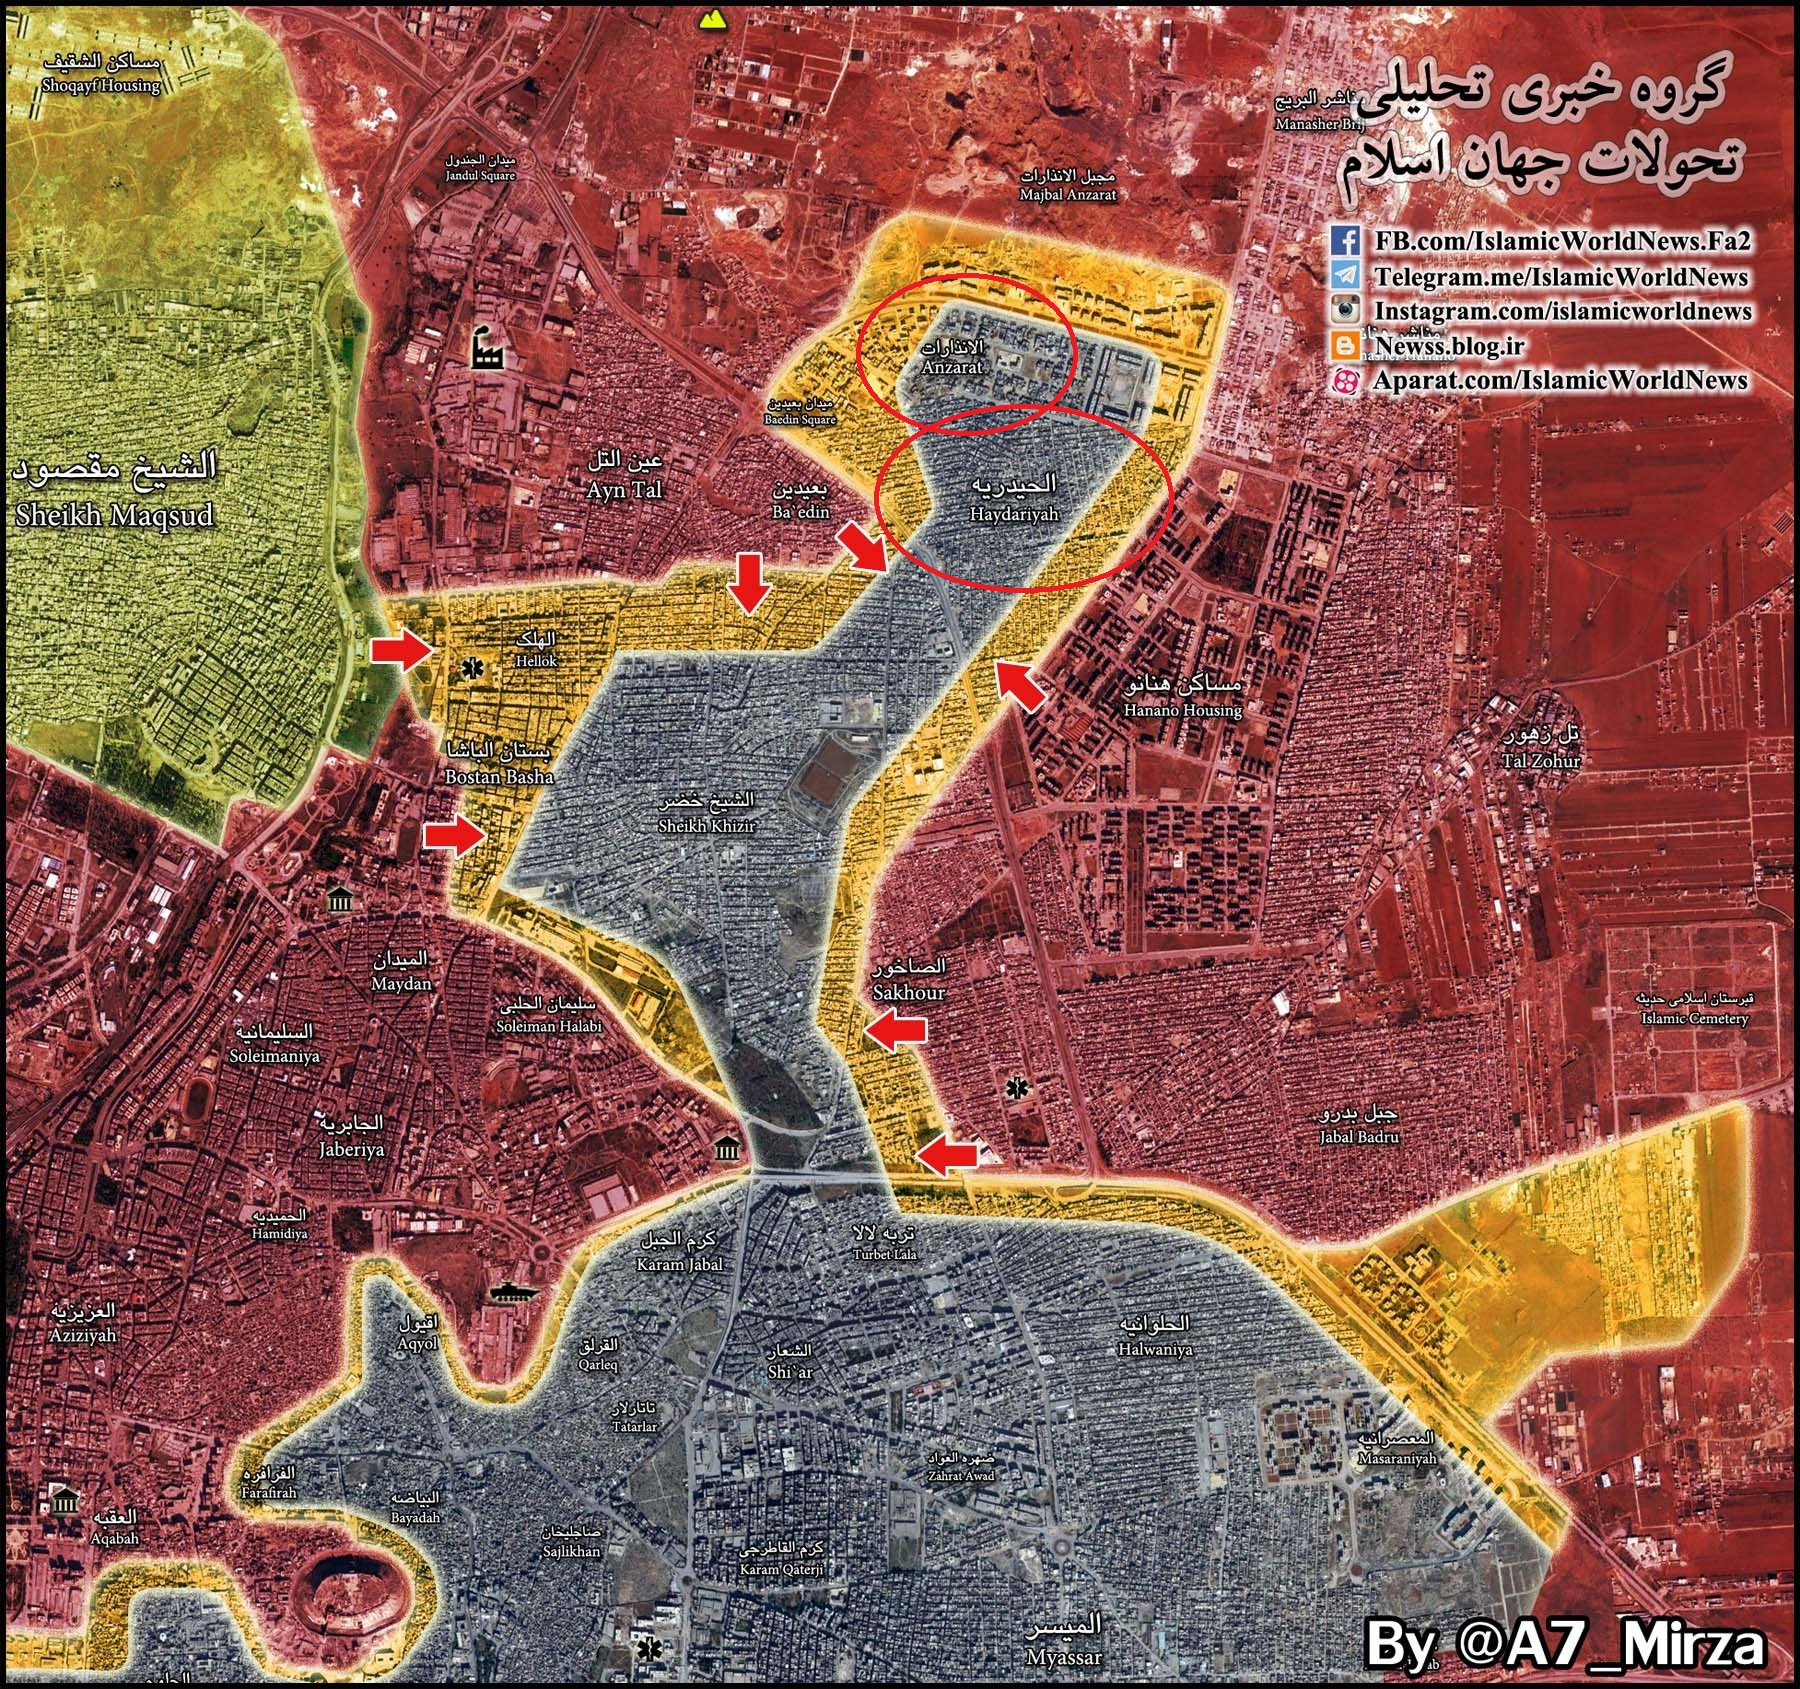 Syrian Army Liberated Handariyah Neighborhood of Aleppo. Militants Fleeing Defense Lines